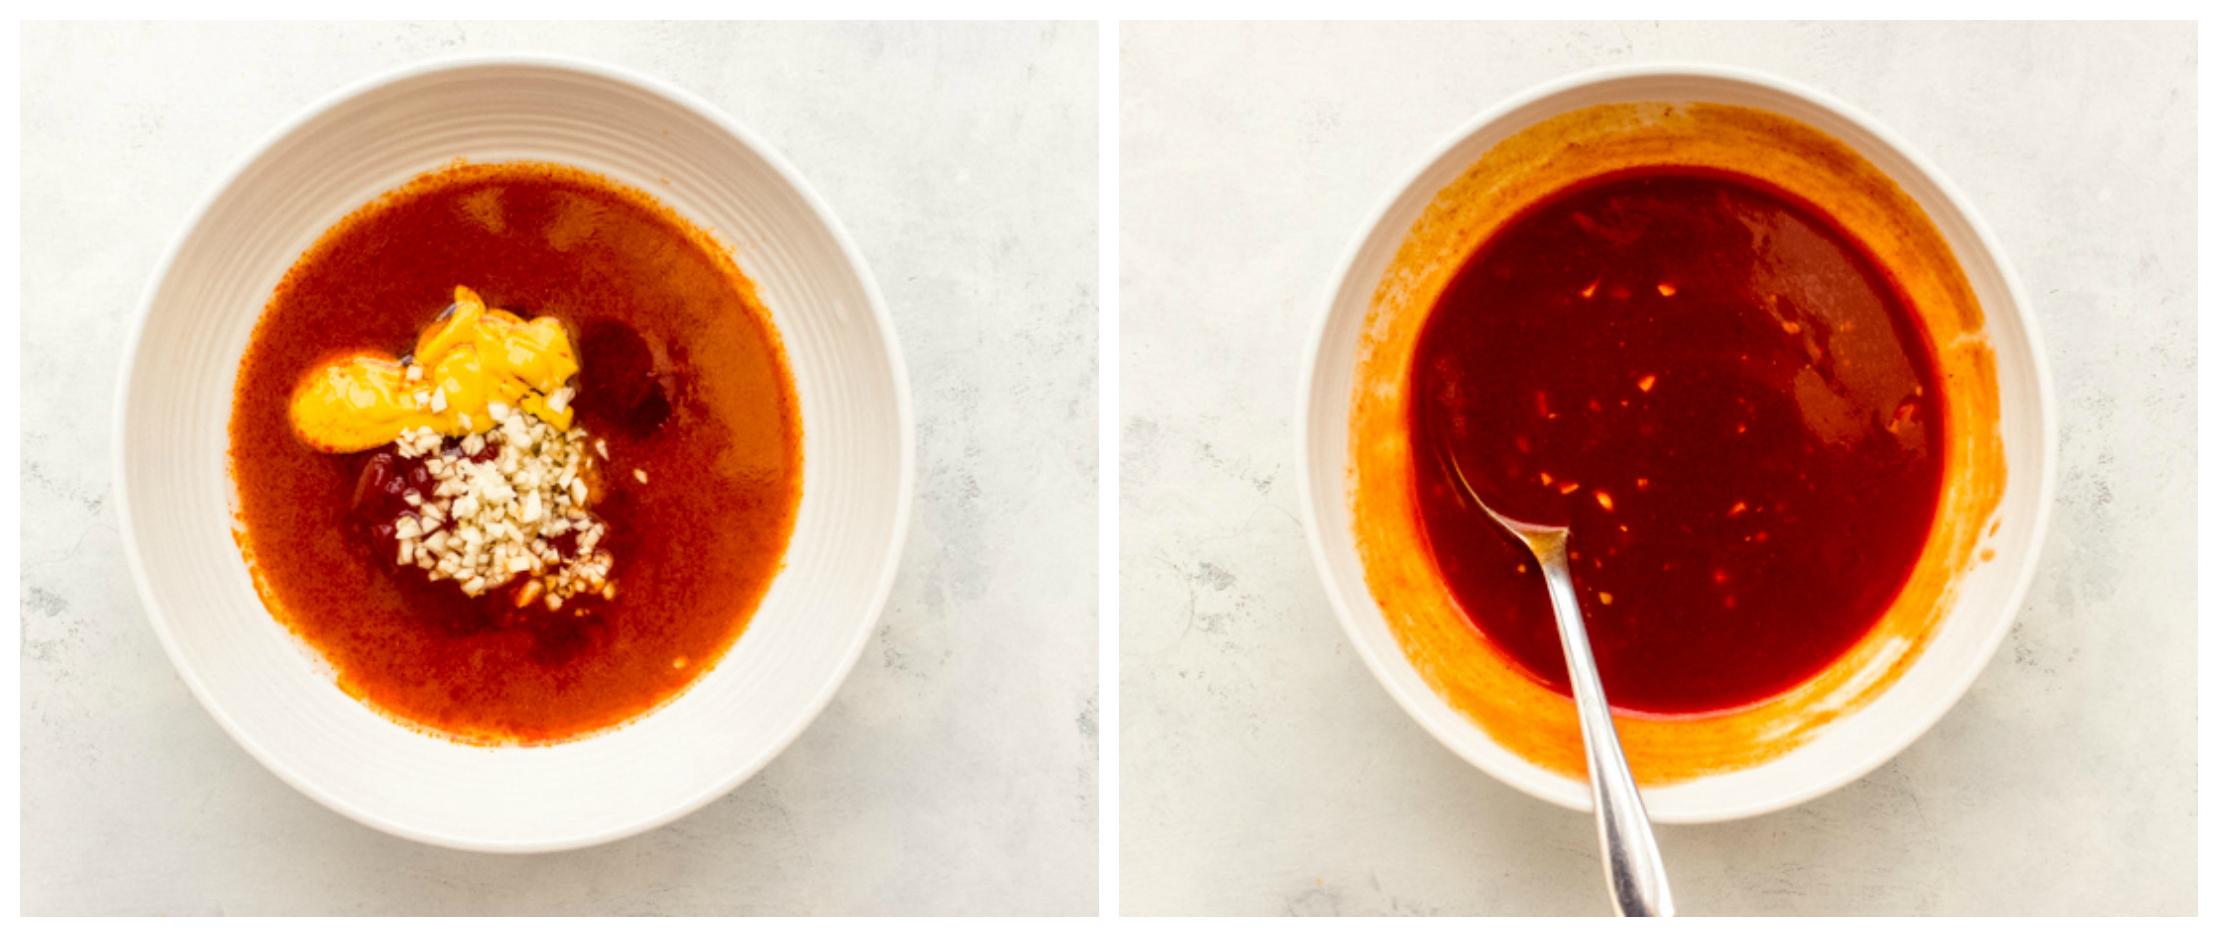 buffalo sauce in a white bowl